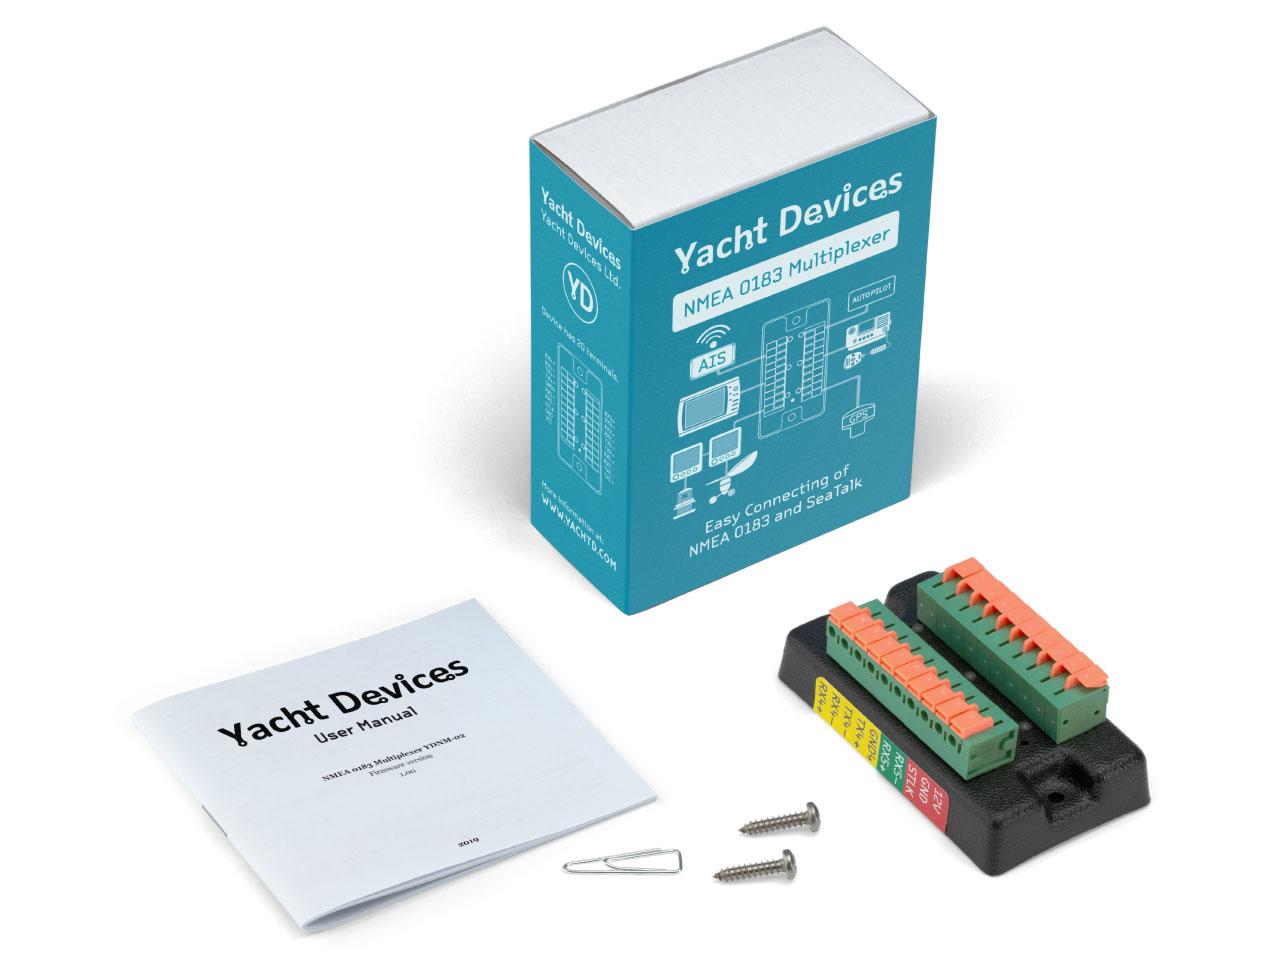 YDNM NMEA0183 multiplexer